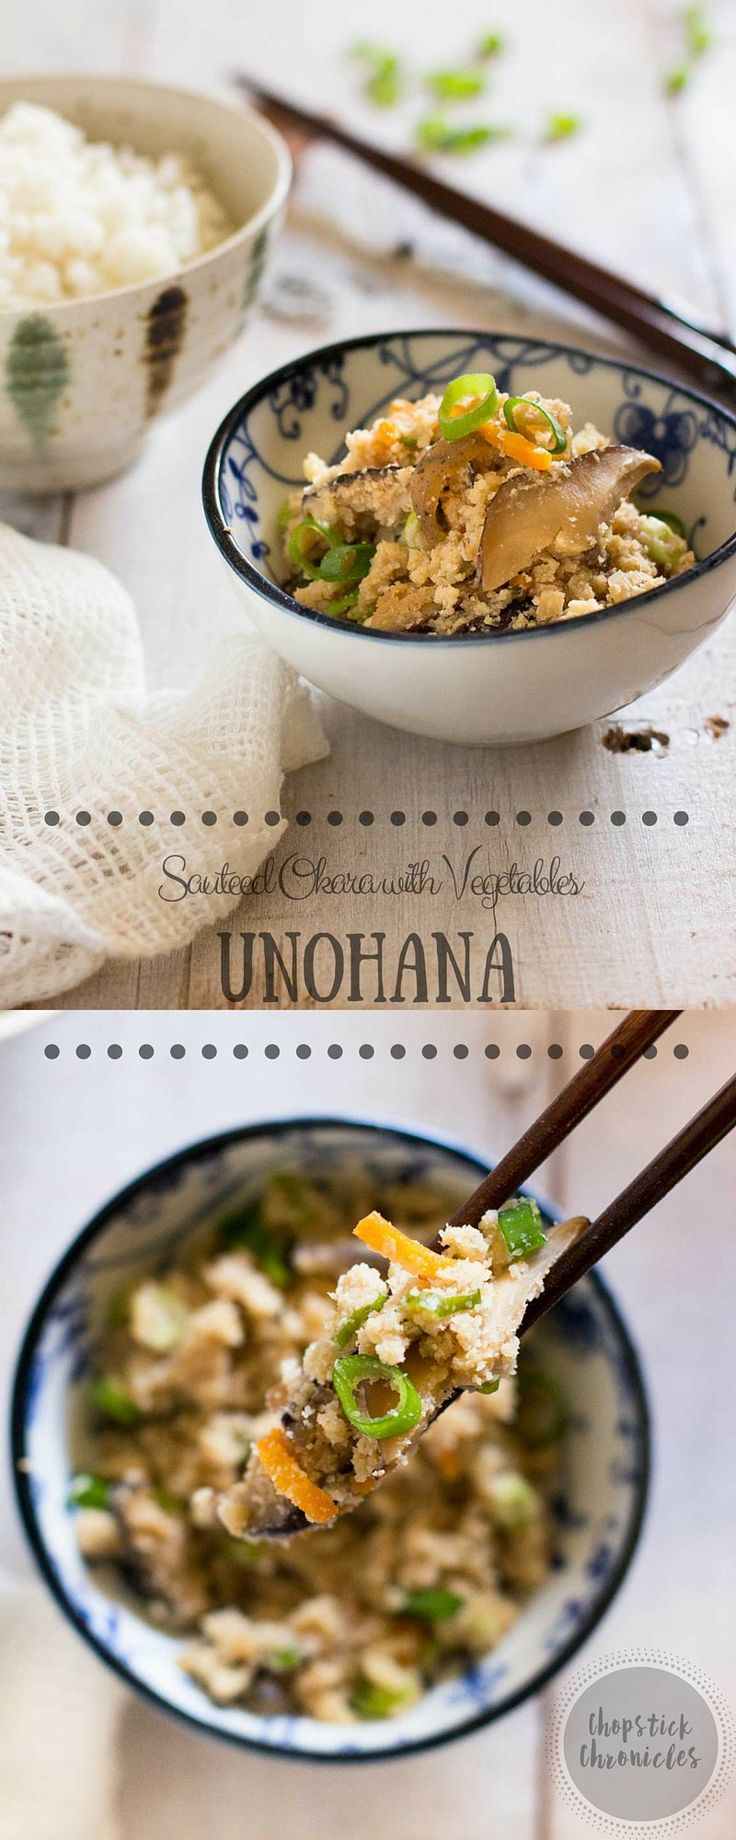 Unohana - Sauteed Okara with Vegetables | Chopstick Chronicles